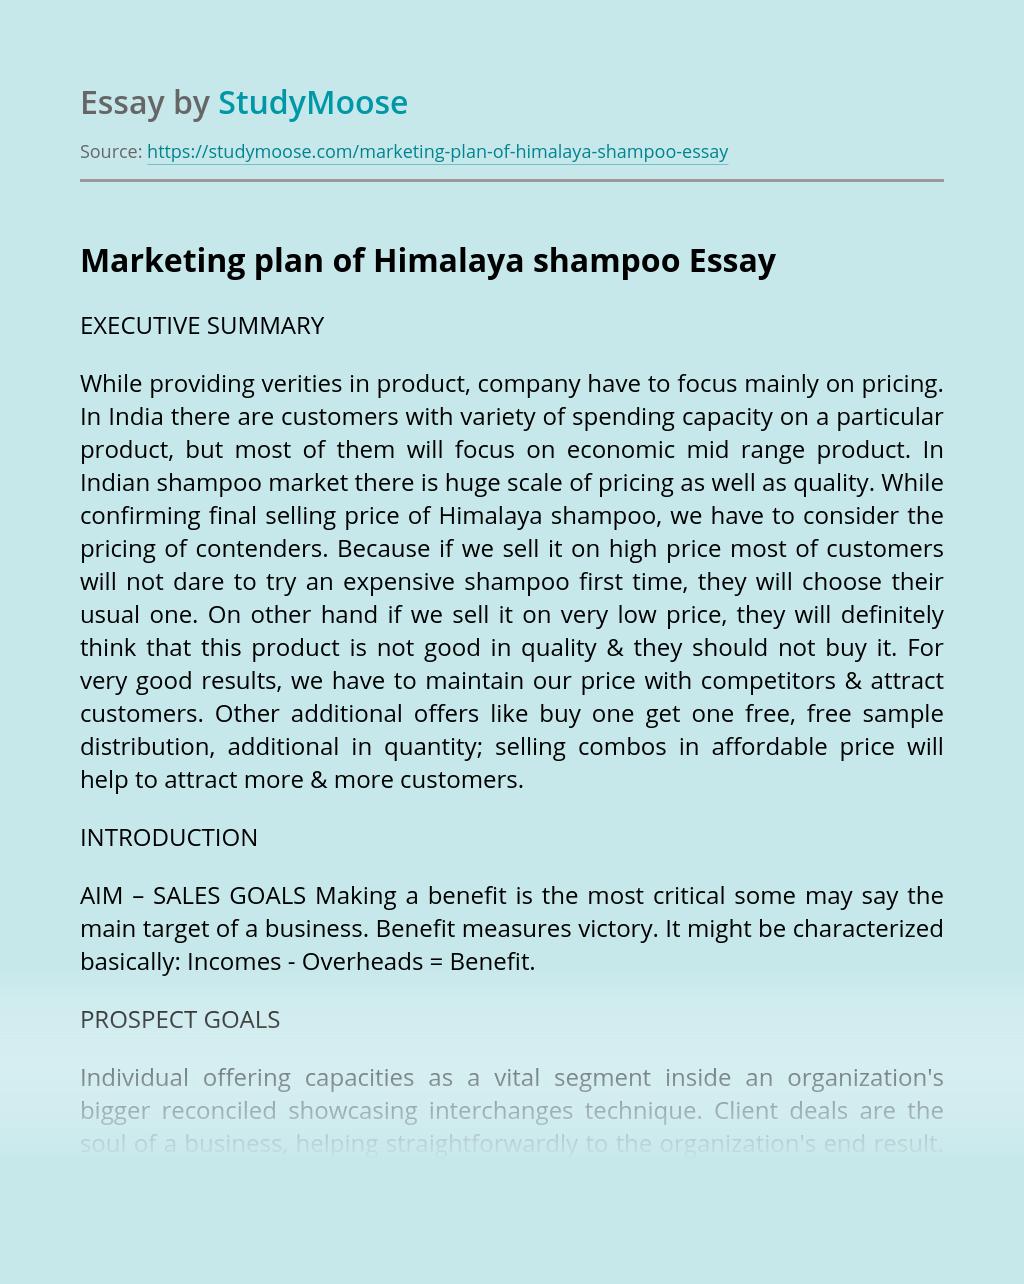 Marketing plan of Himalaya shampoo